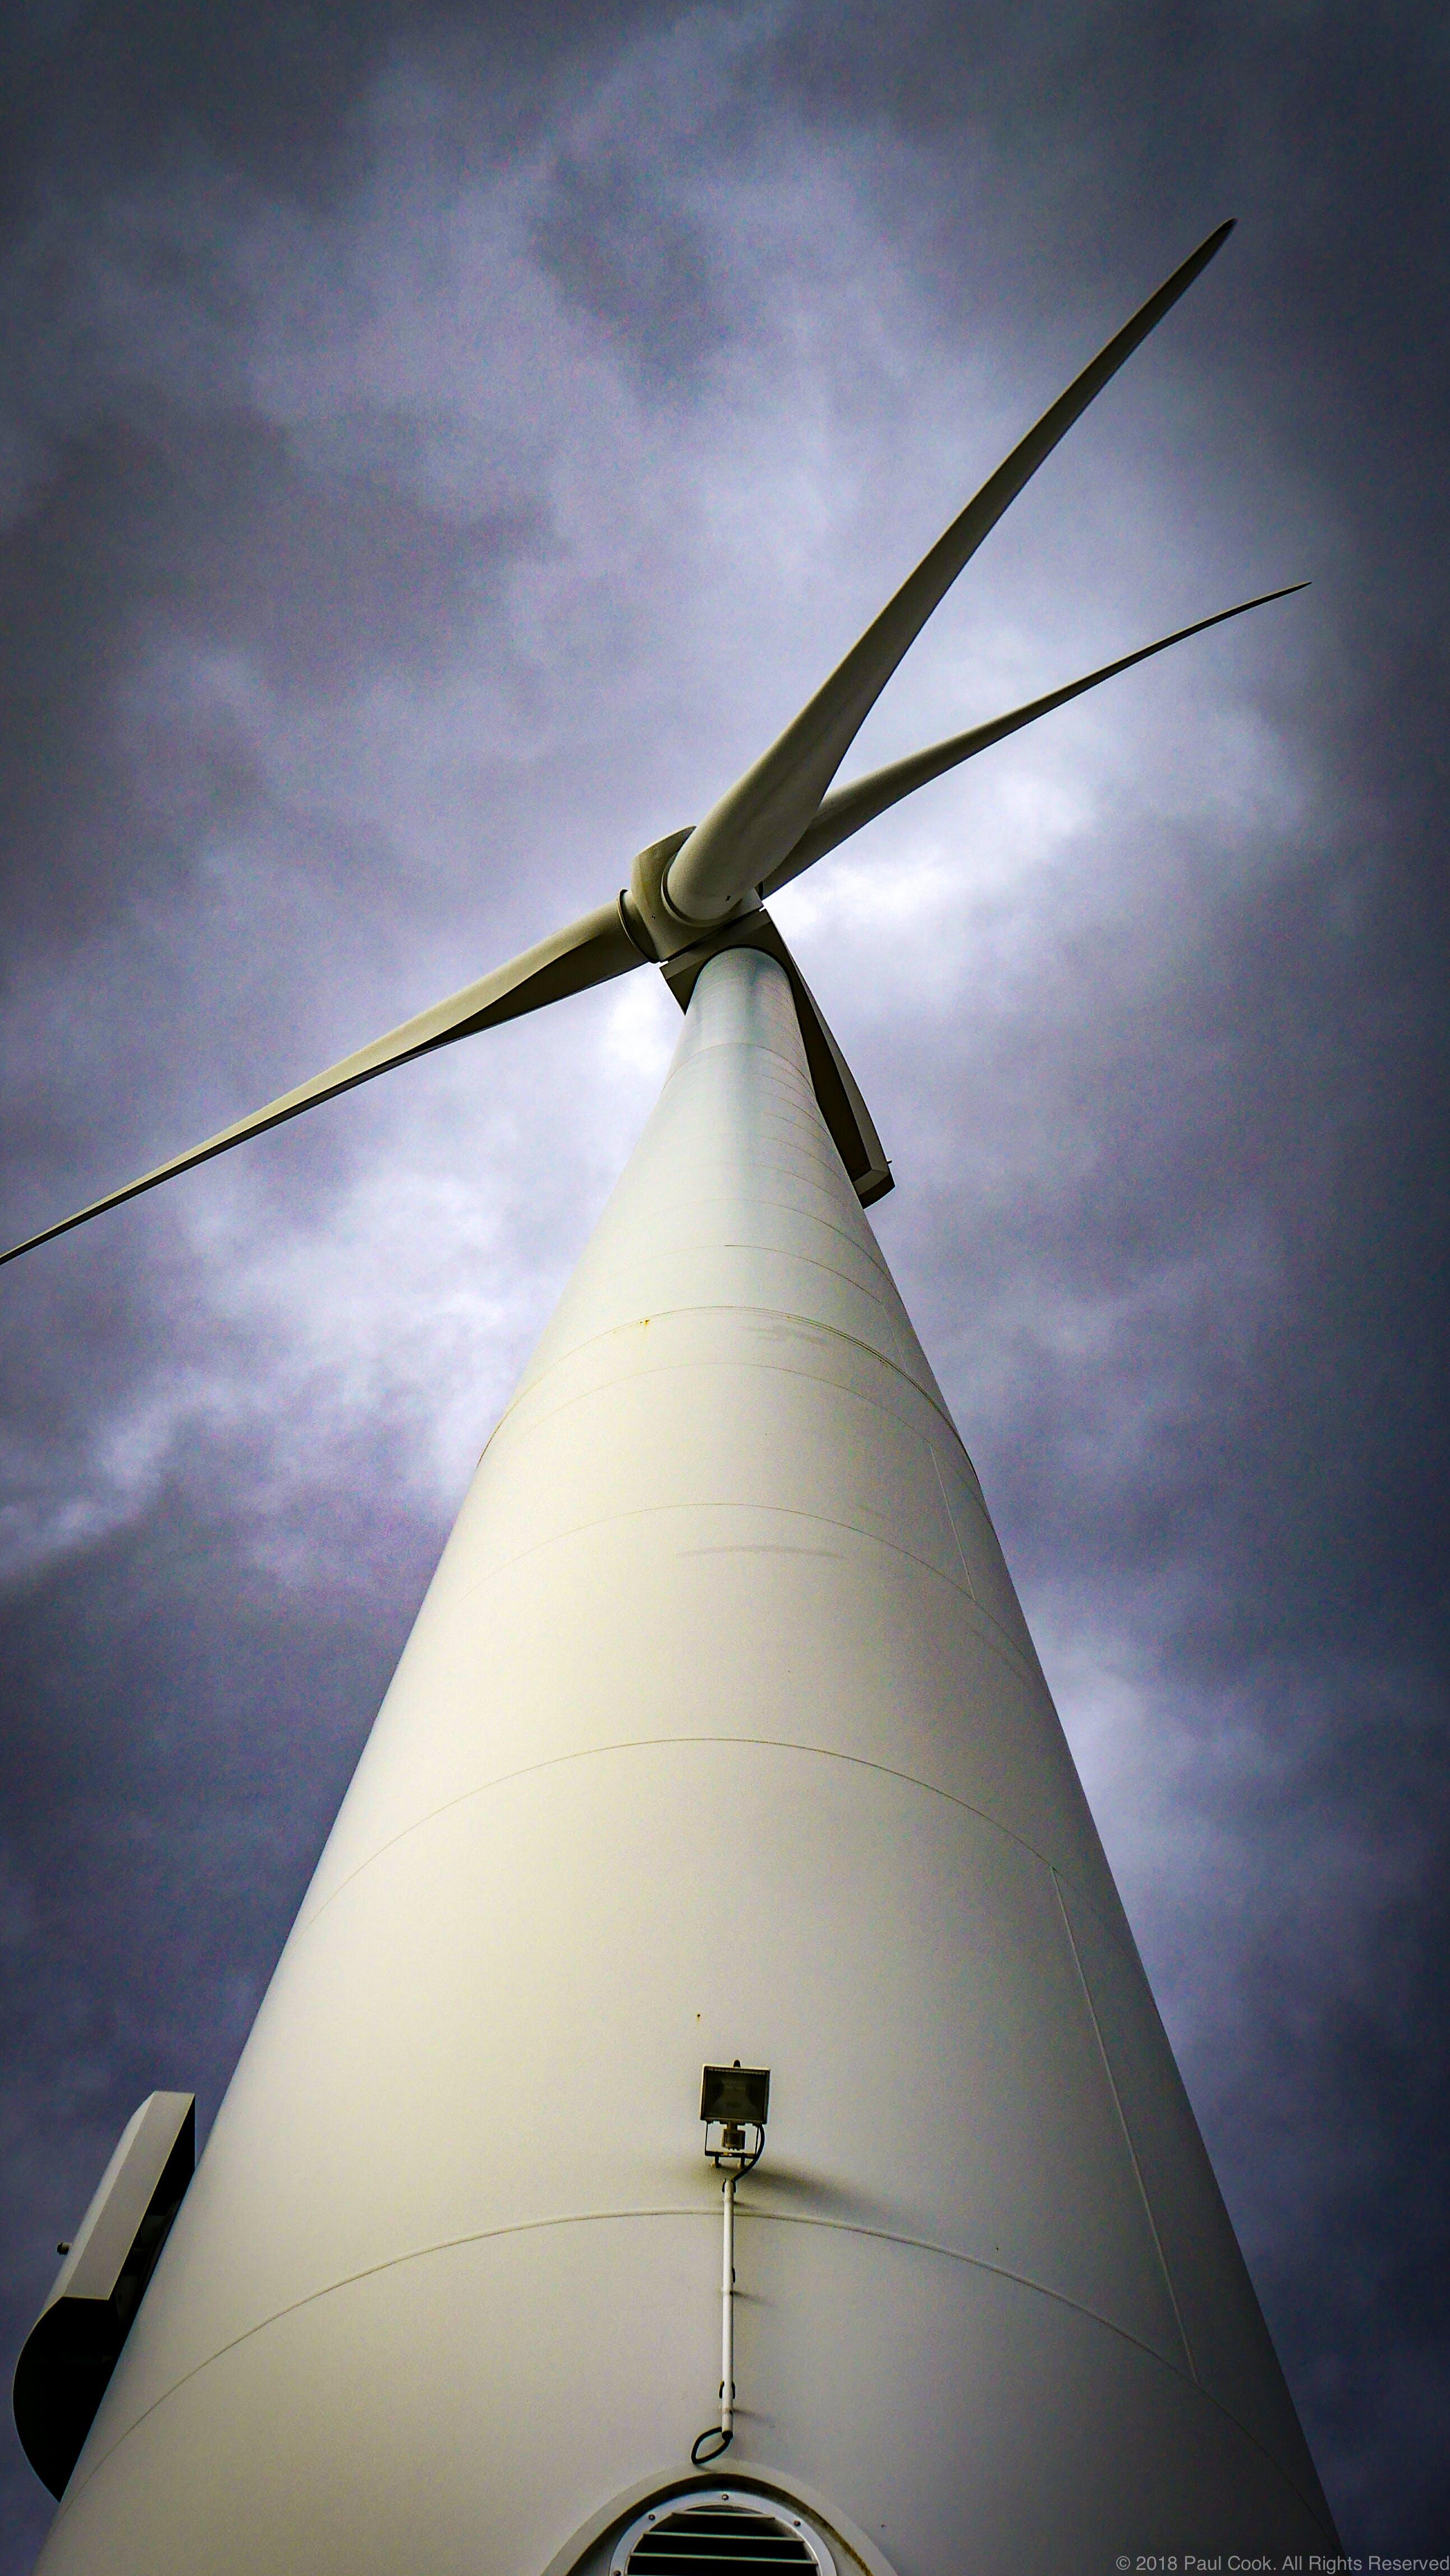 Free stock photo of adobe creative cloud, art, dramatic, dystopian